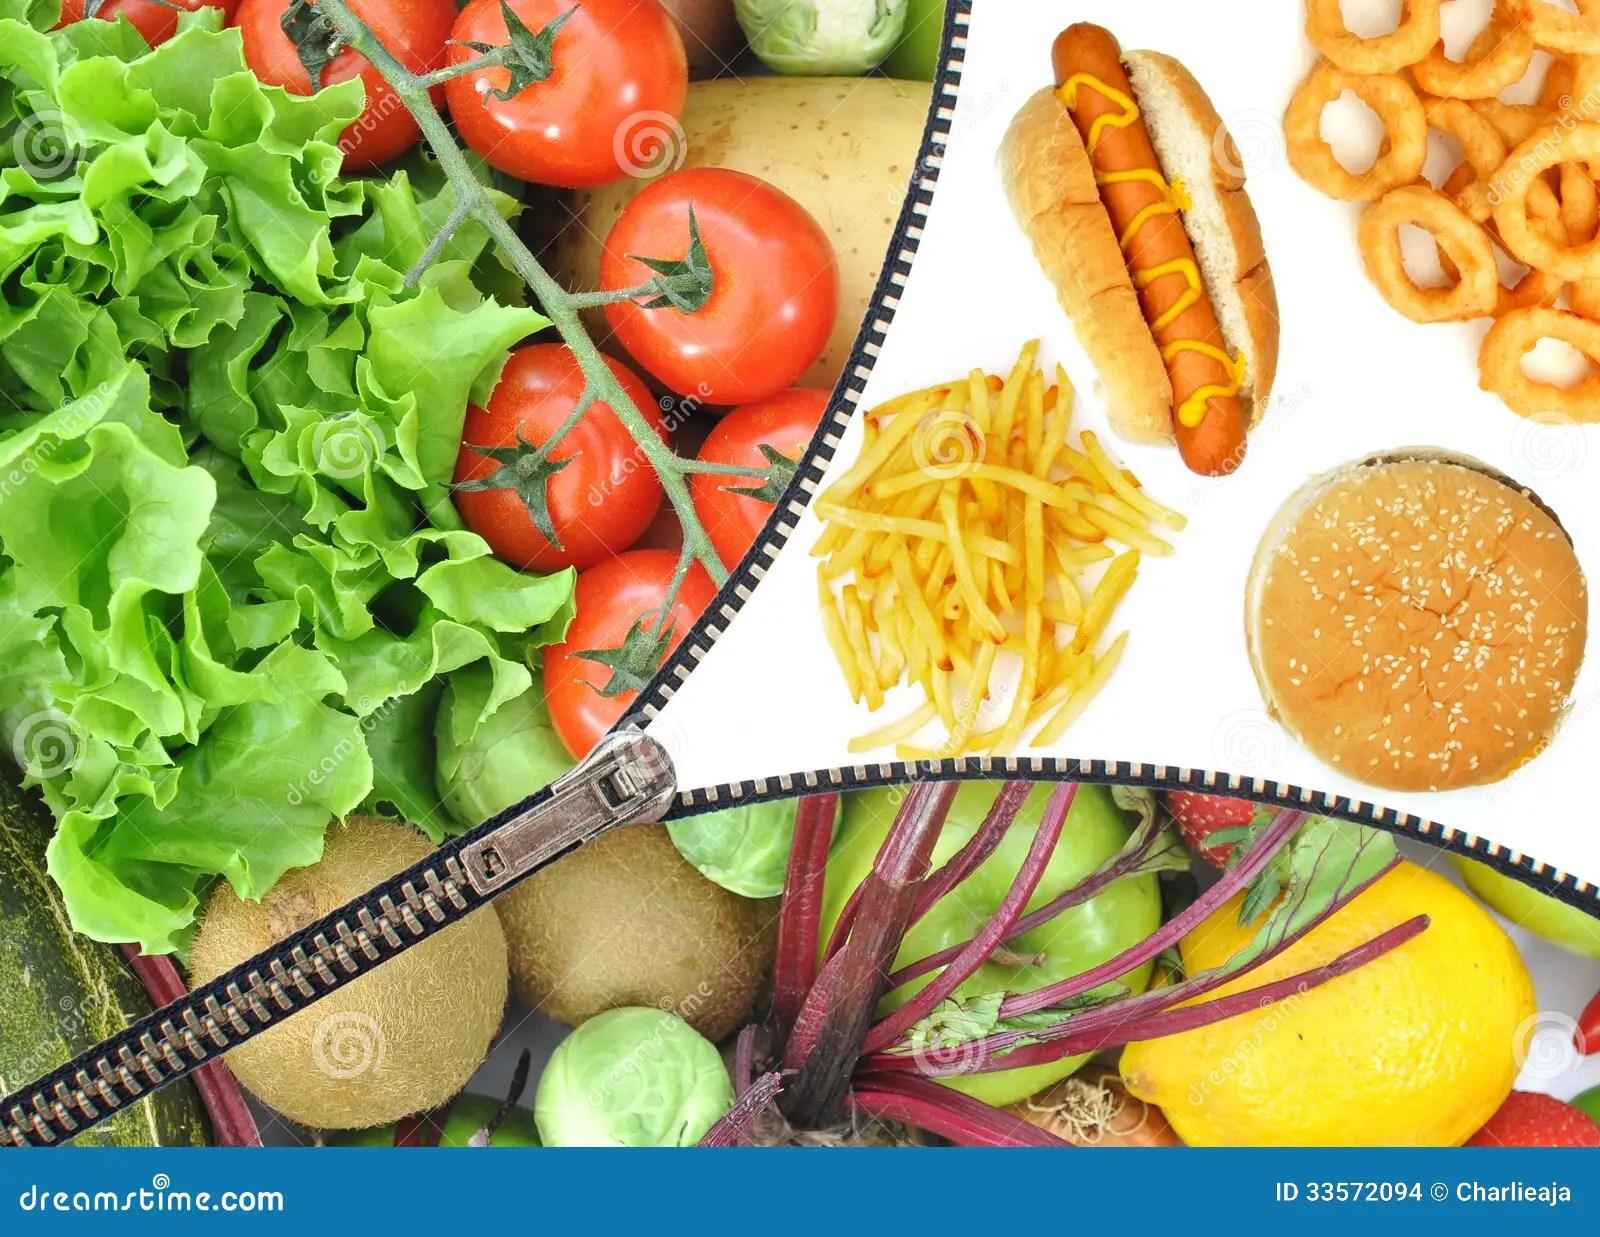 Healthy Or Unhealthy Food Choice Stock Photo